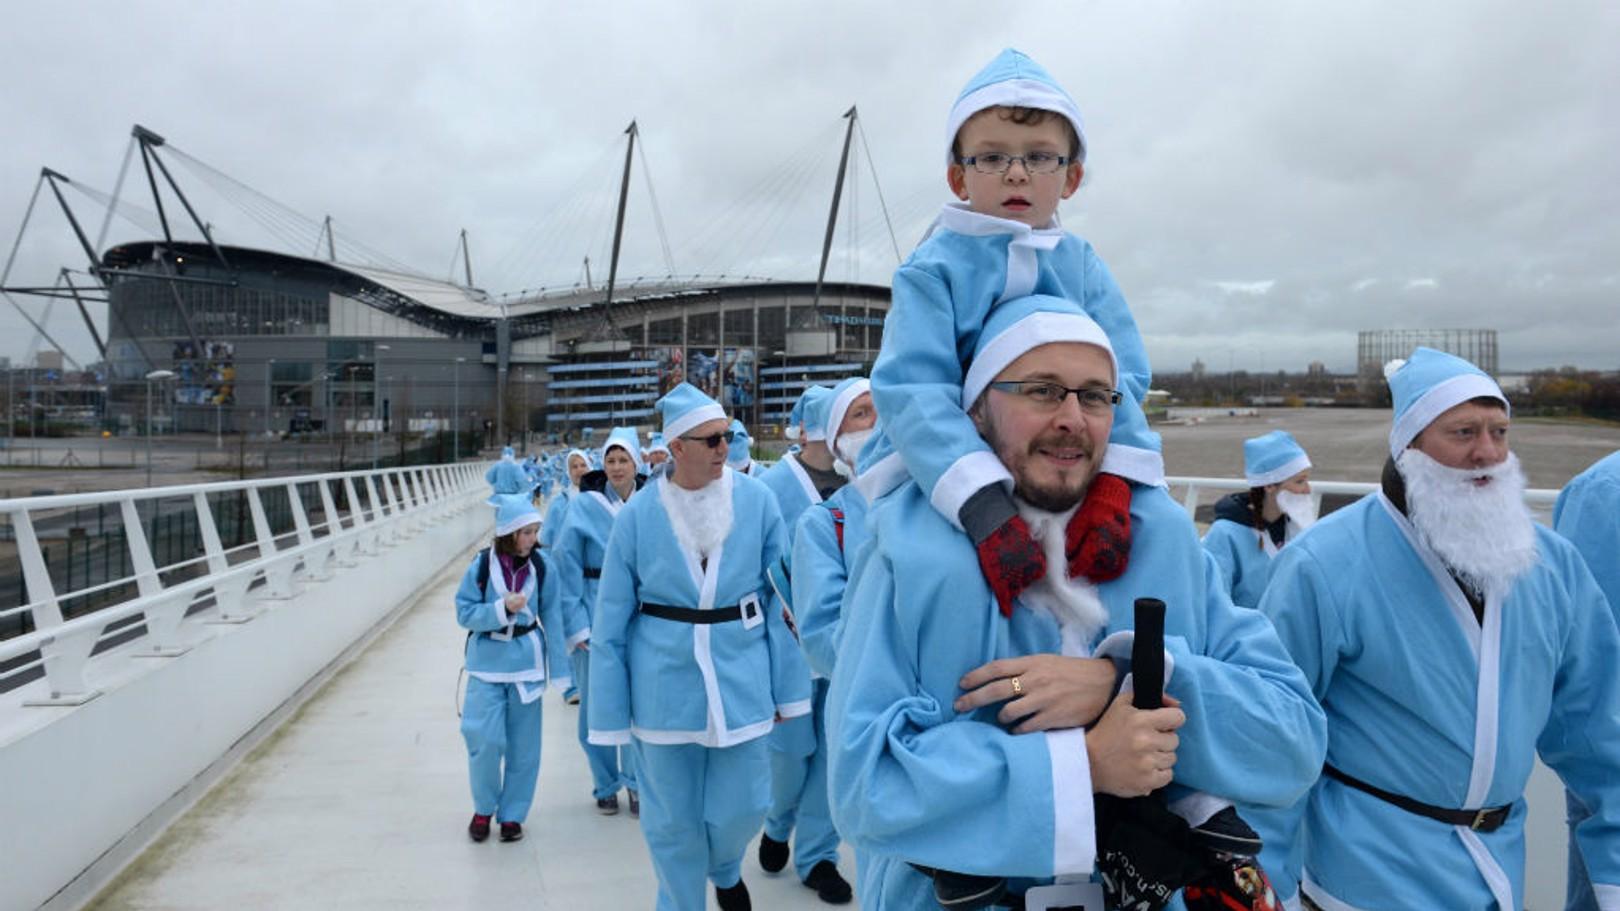 BLUE CHRISTMAS: City fans enjoy last year's Santa Stroll